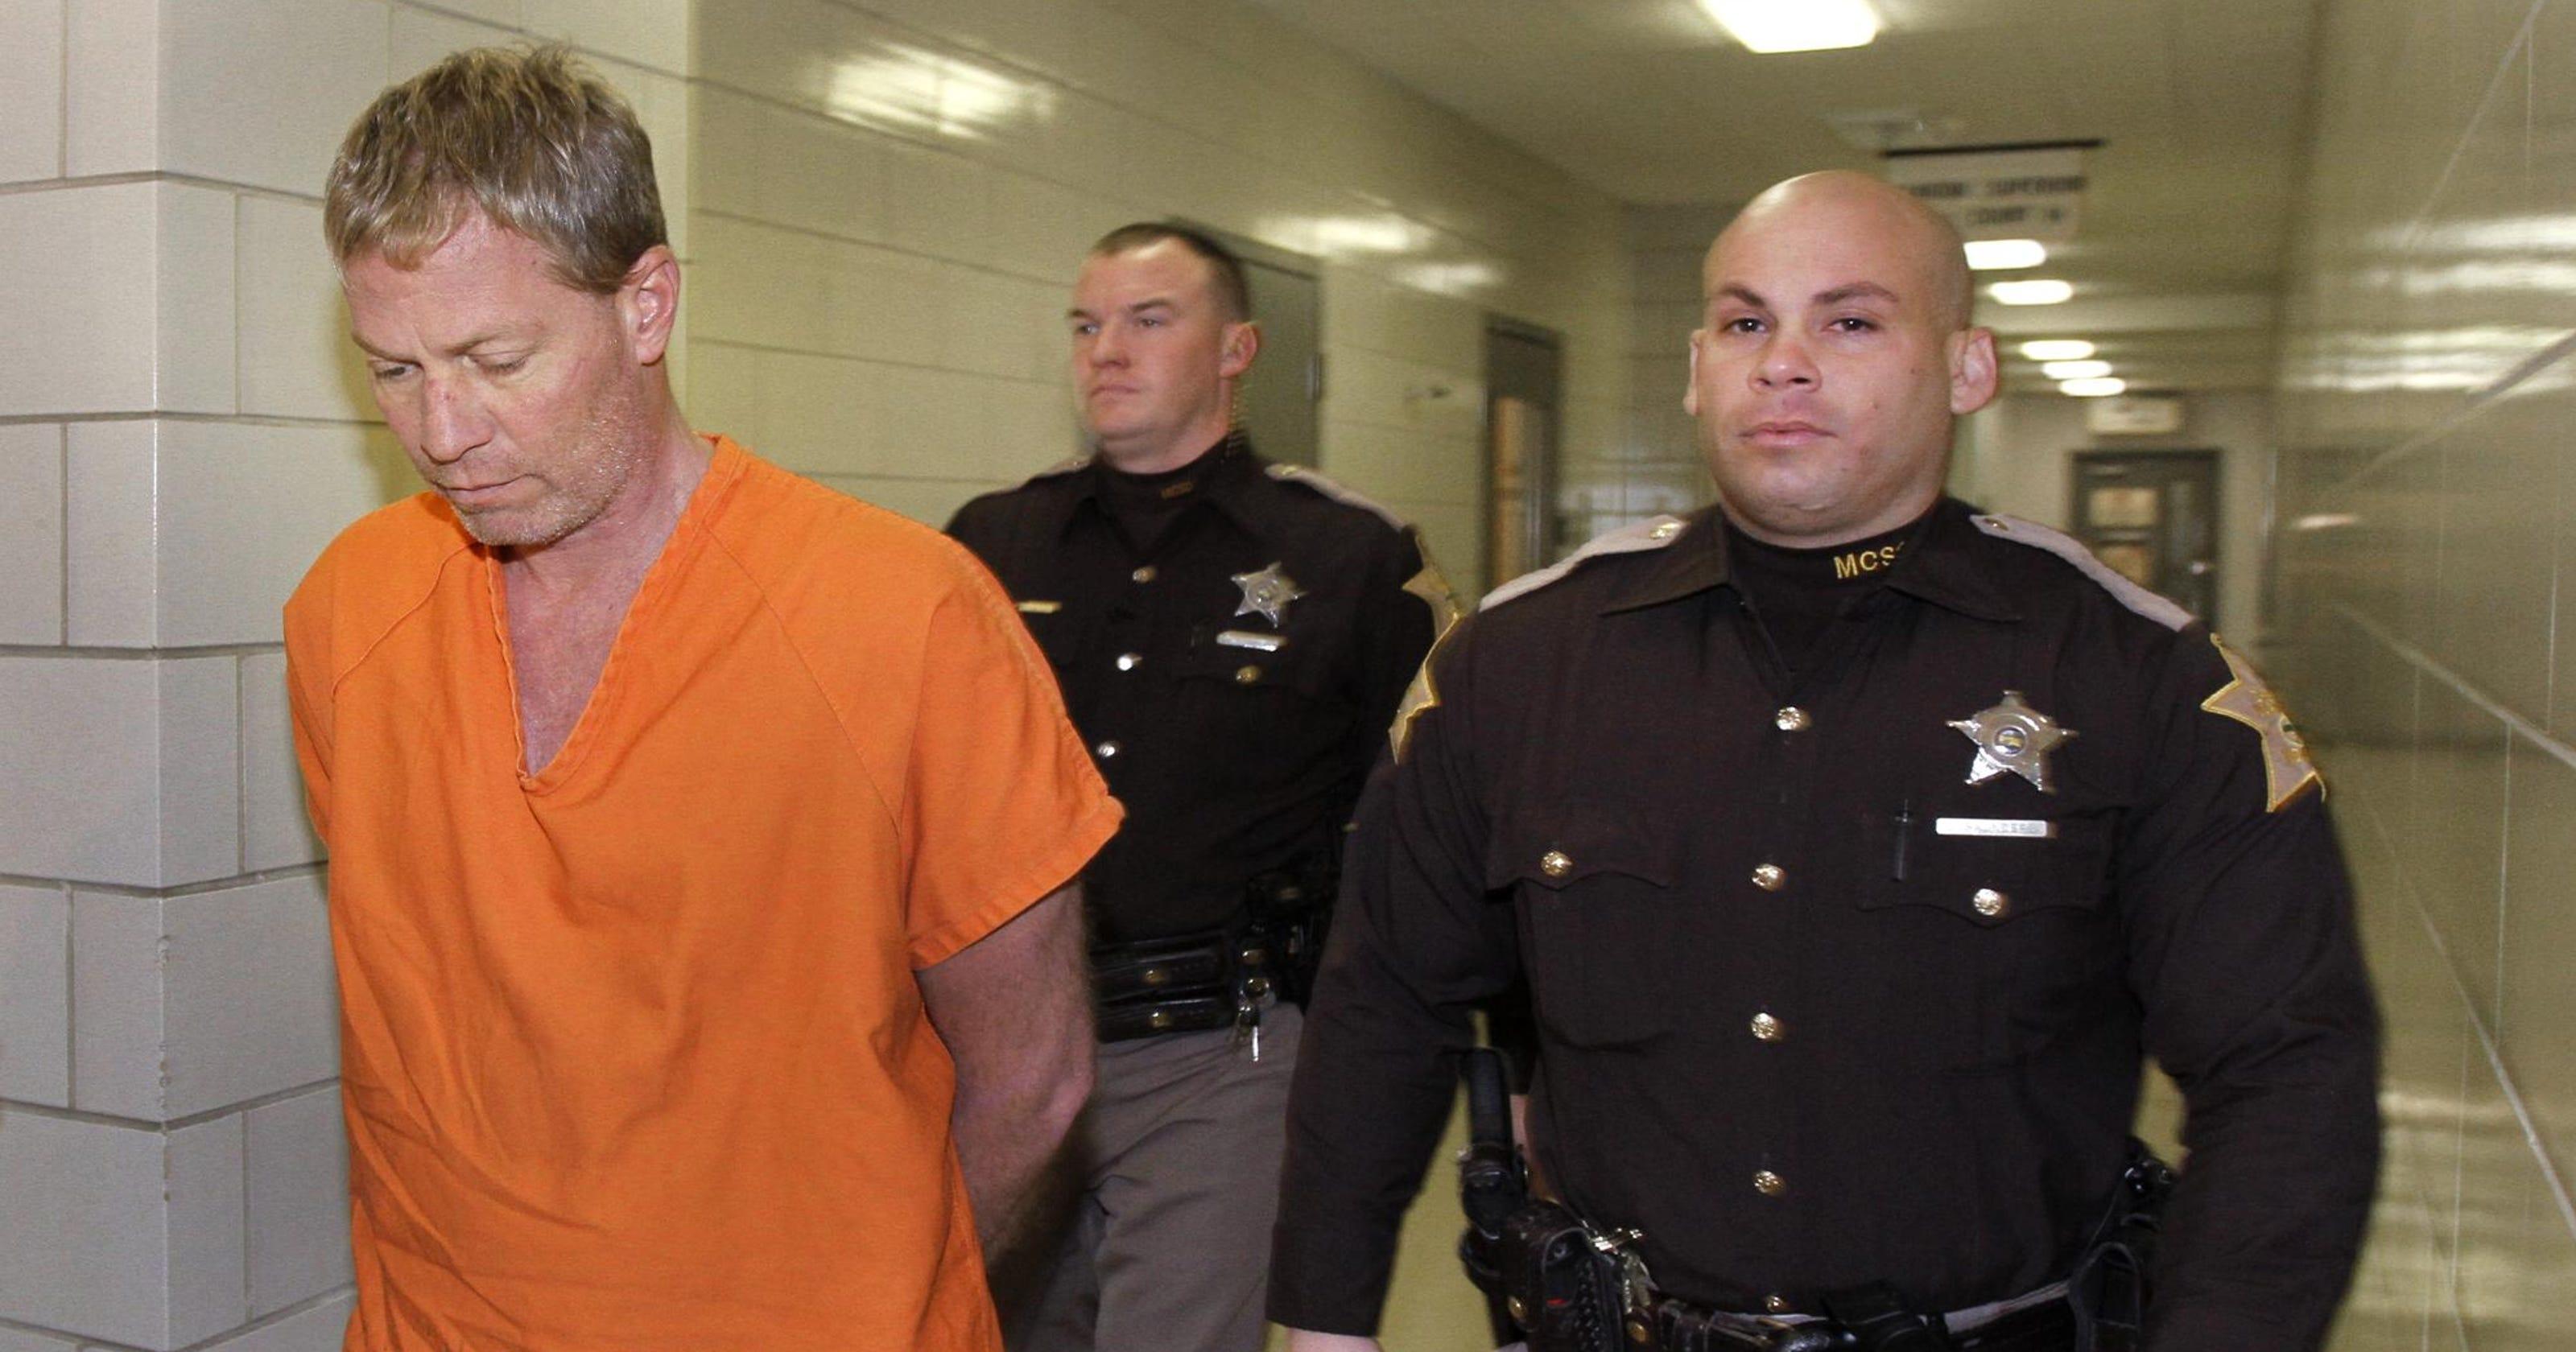 Richmond Hill trial: Jurors soon to decide 1 man's fate